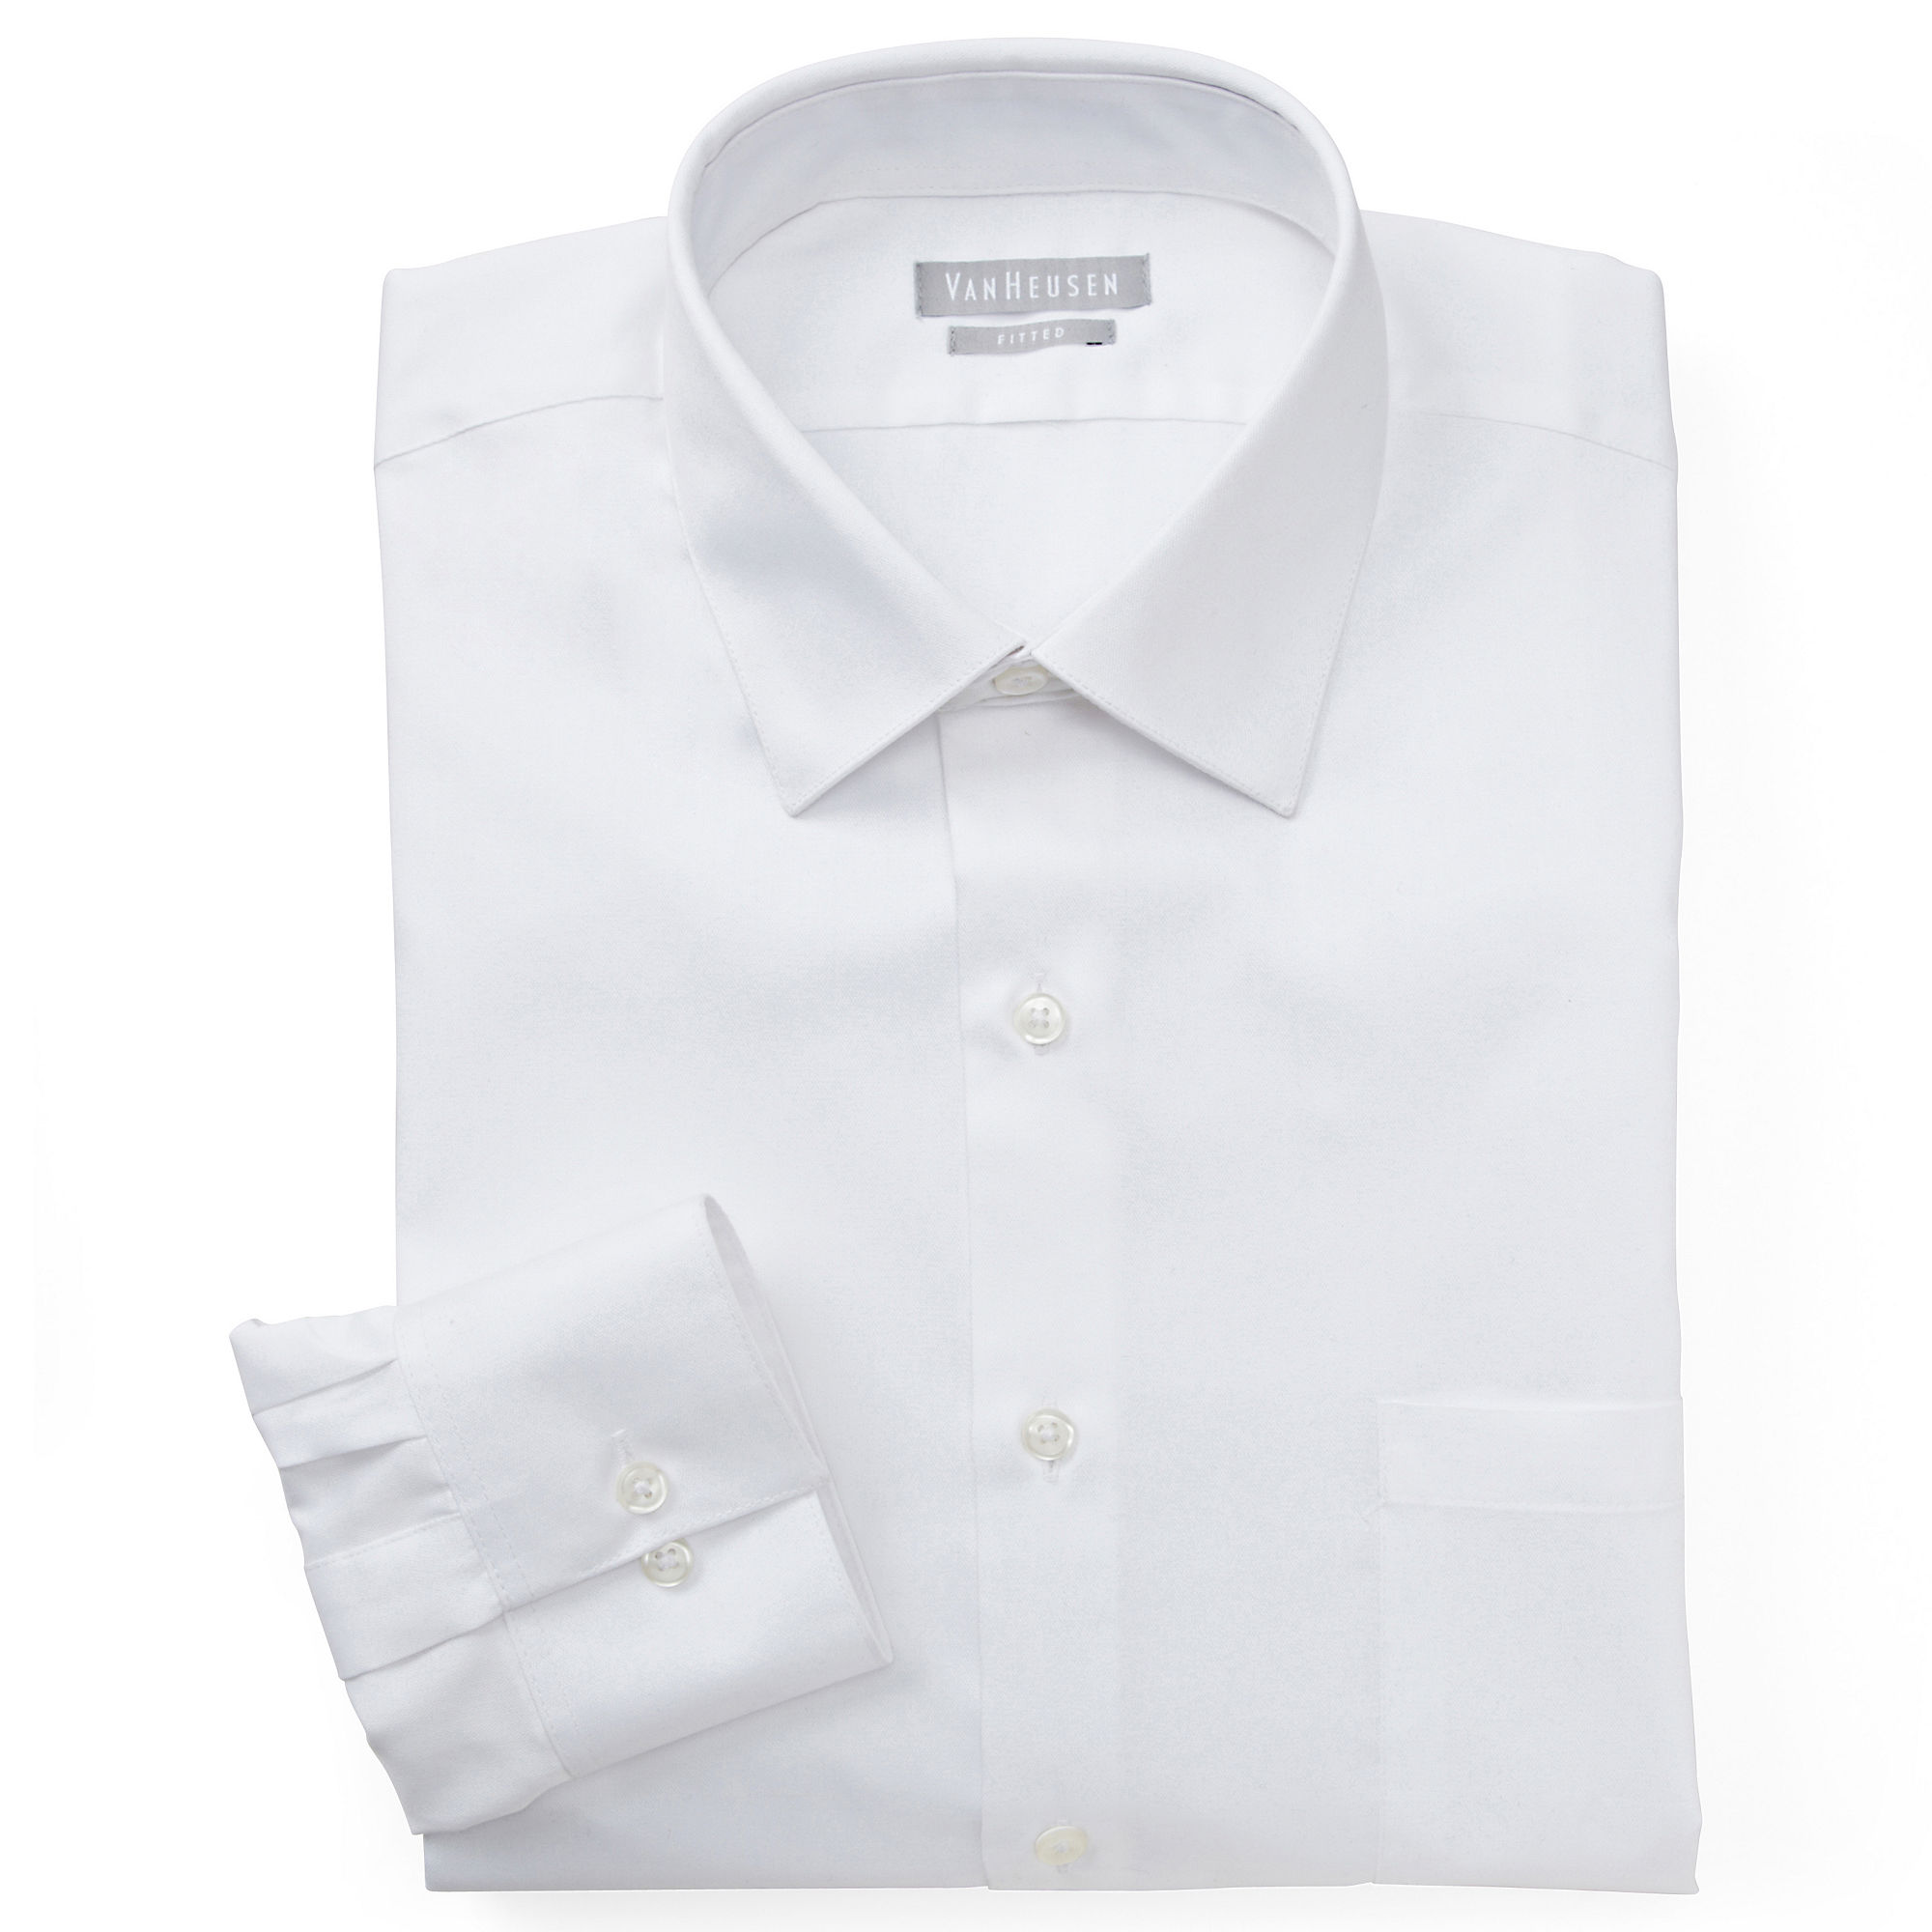 Upc 88543230207 van heusen no iron lux sateen dress for Van heusen iron free shirts